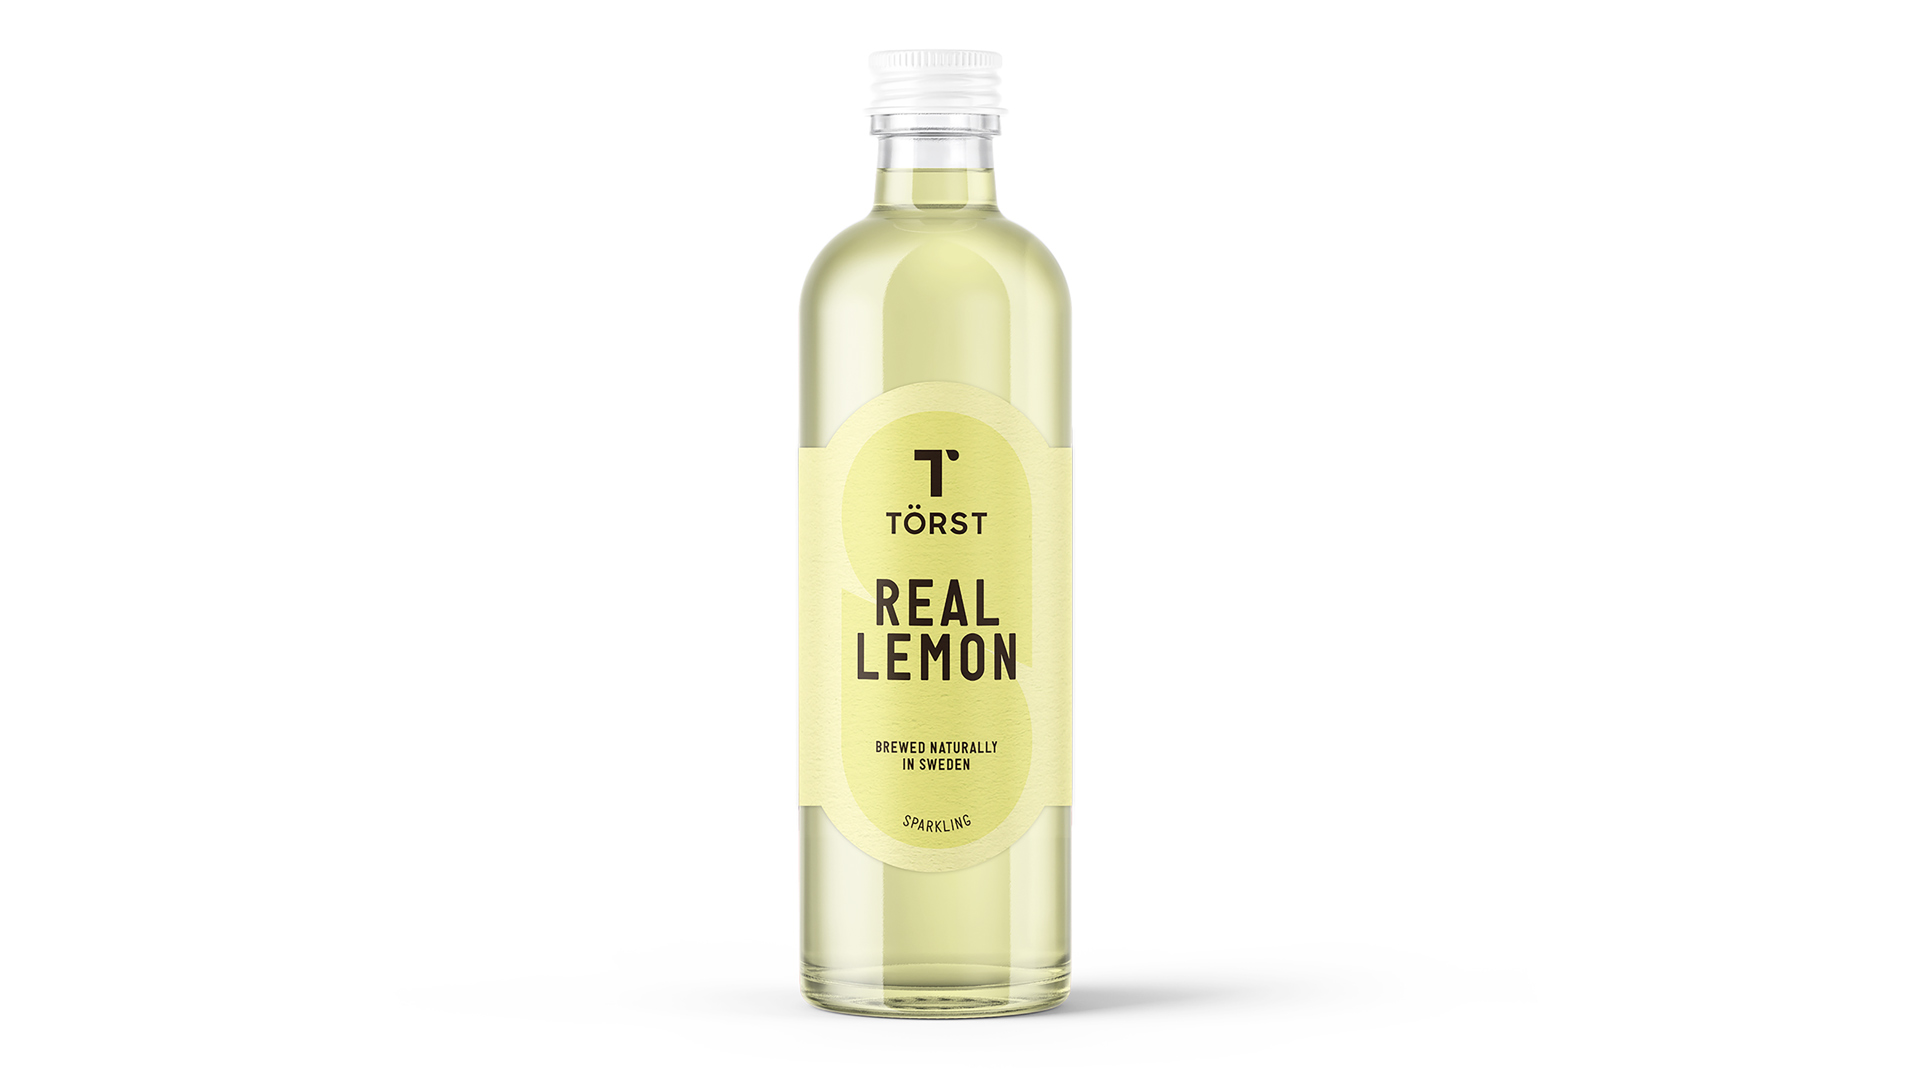 Törst – Real Lemon